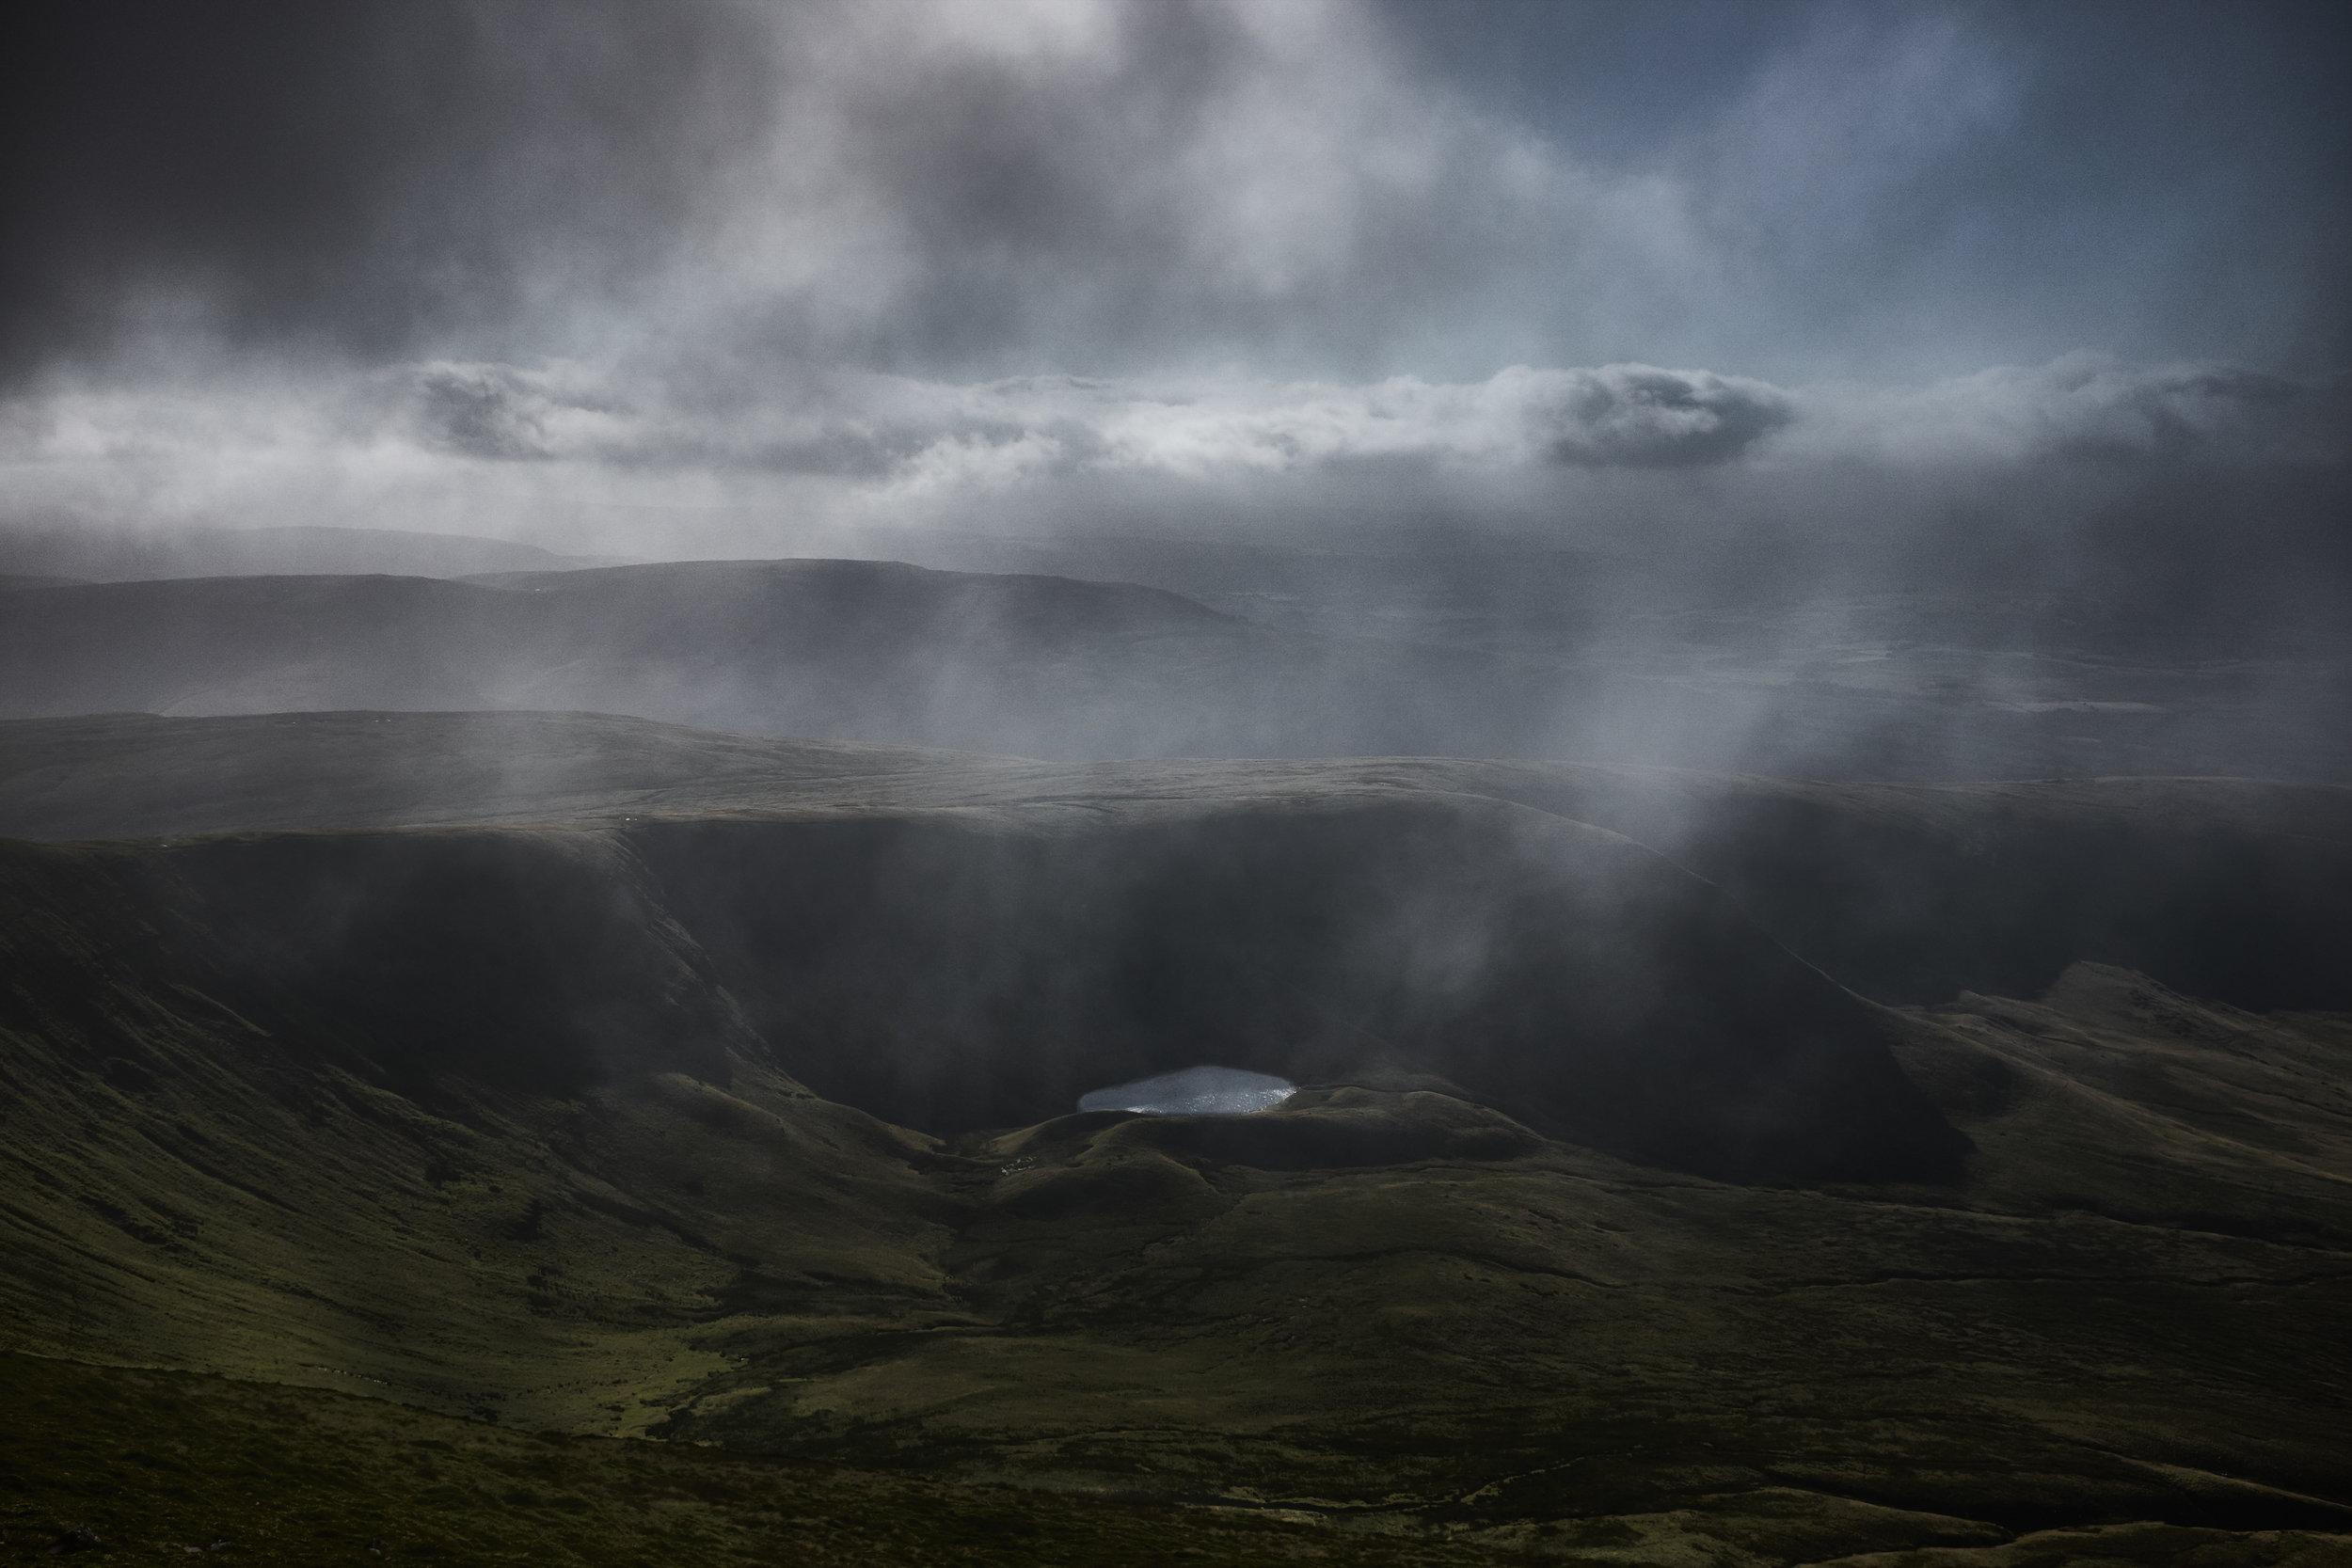 From Pen y Fan as a storm passes. Fujifilm X100T